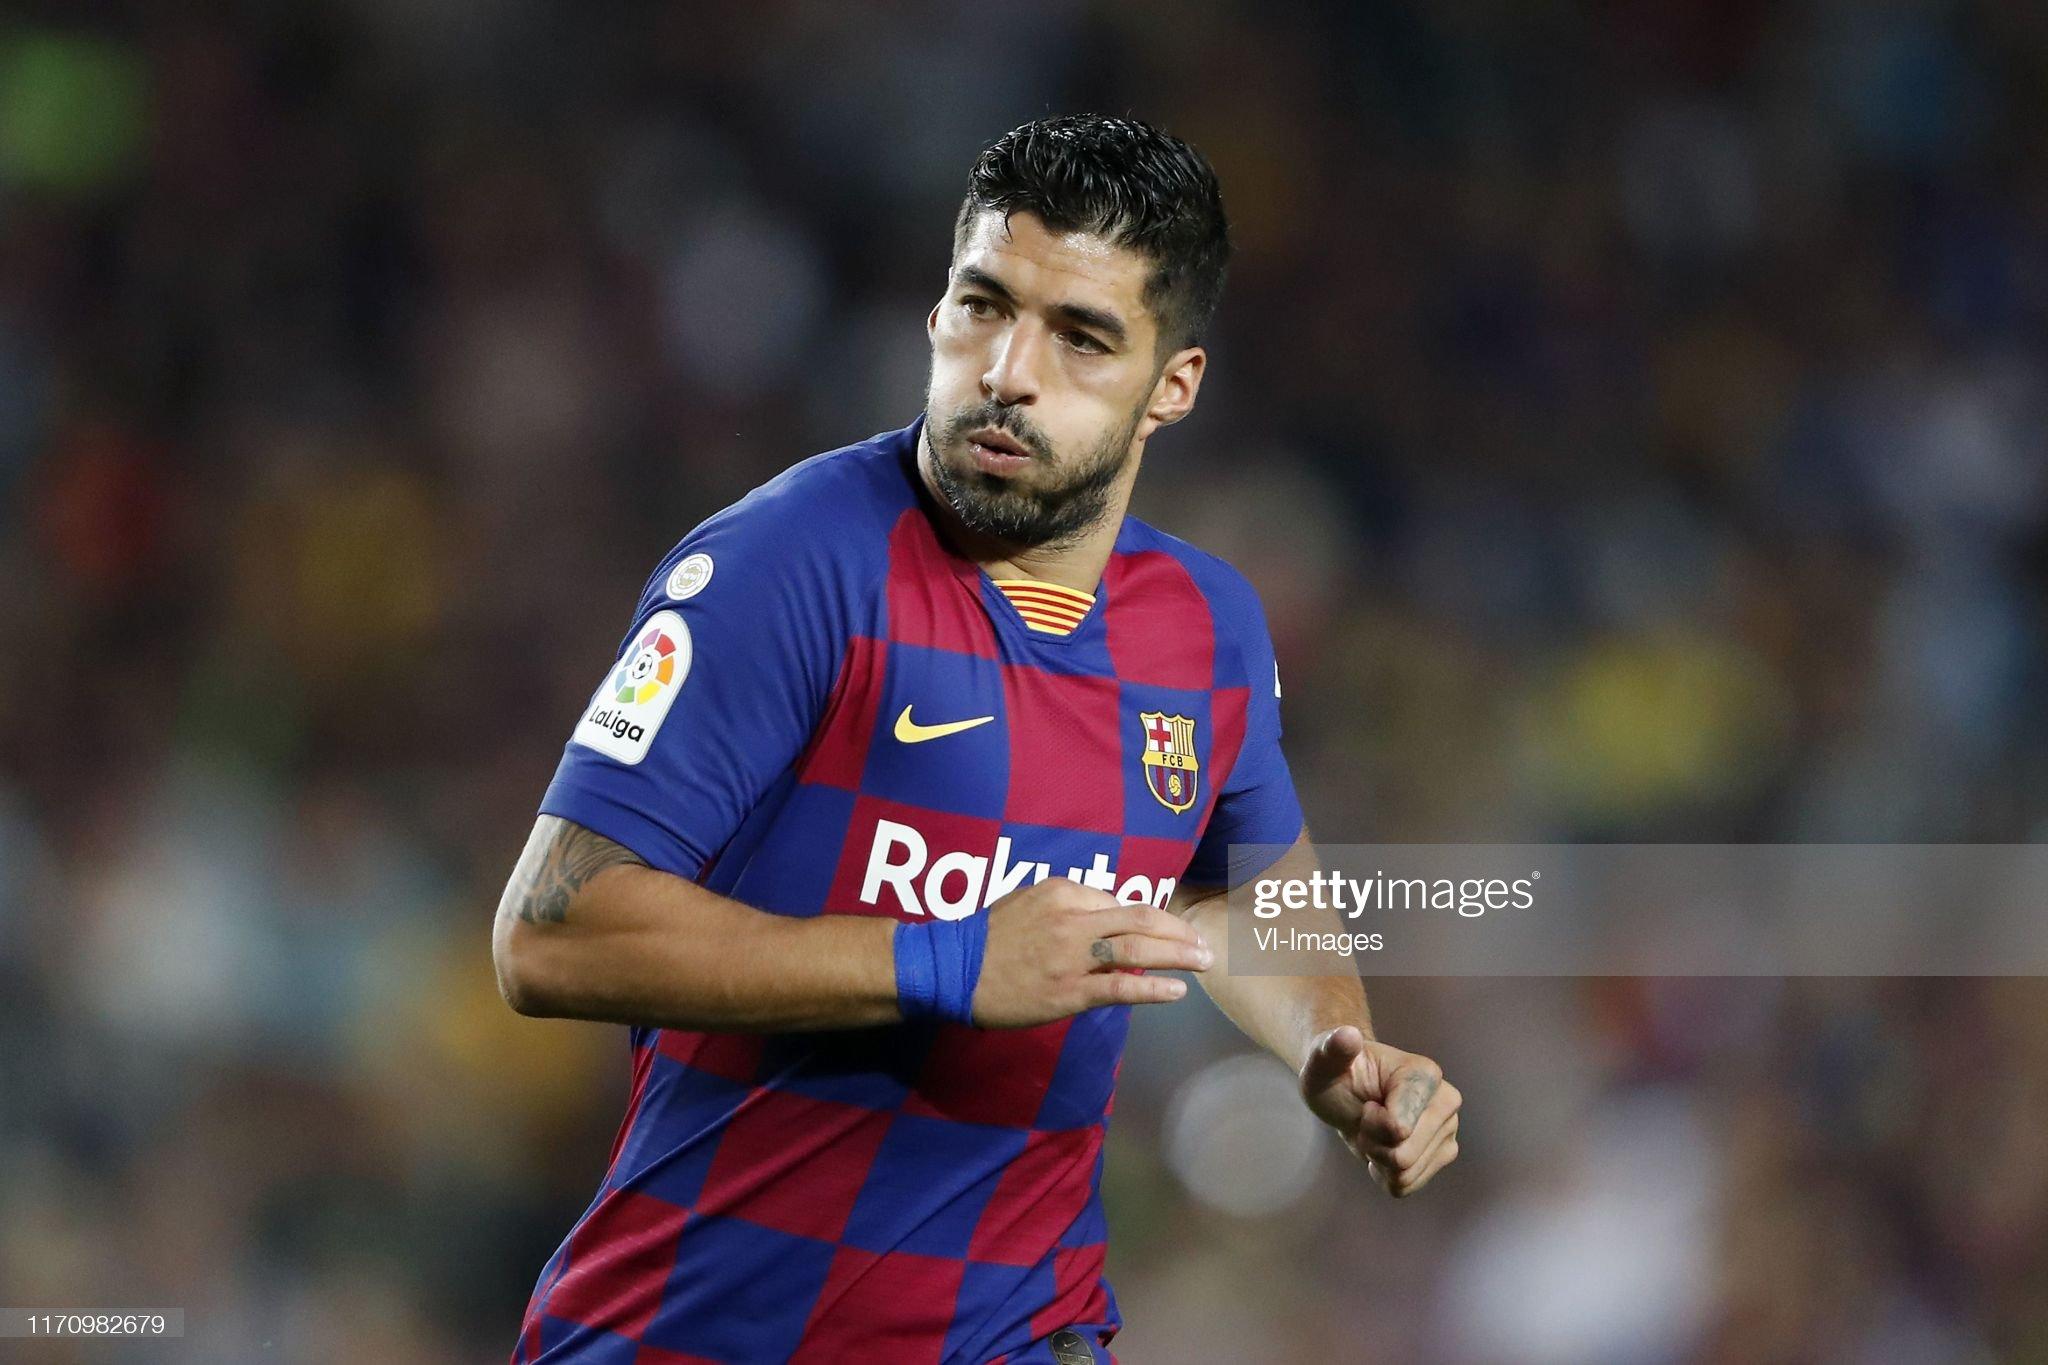 صور مباراة : برشلونة - فياريال 2-1 ( 24-09-2019 )  Luis-suarez-of-fc-barcelona-during-the-laliga-santander-match-between-picture-id1170982679?s=2048x2048